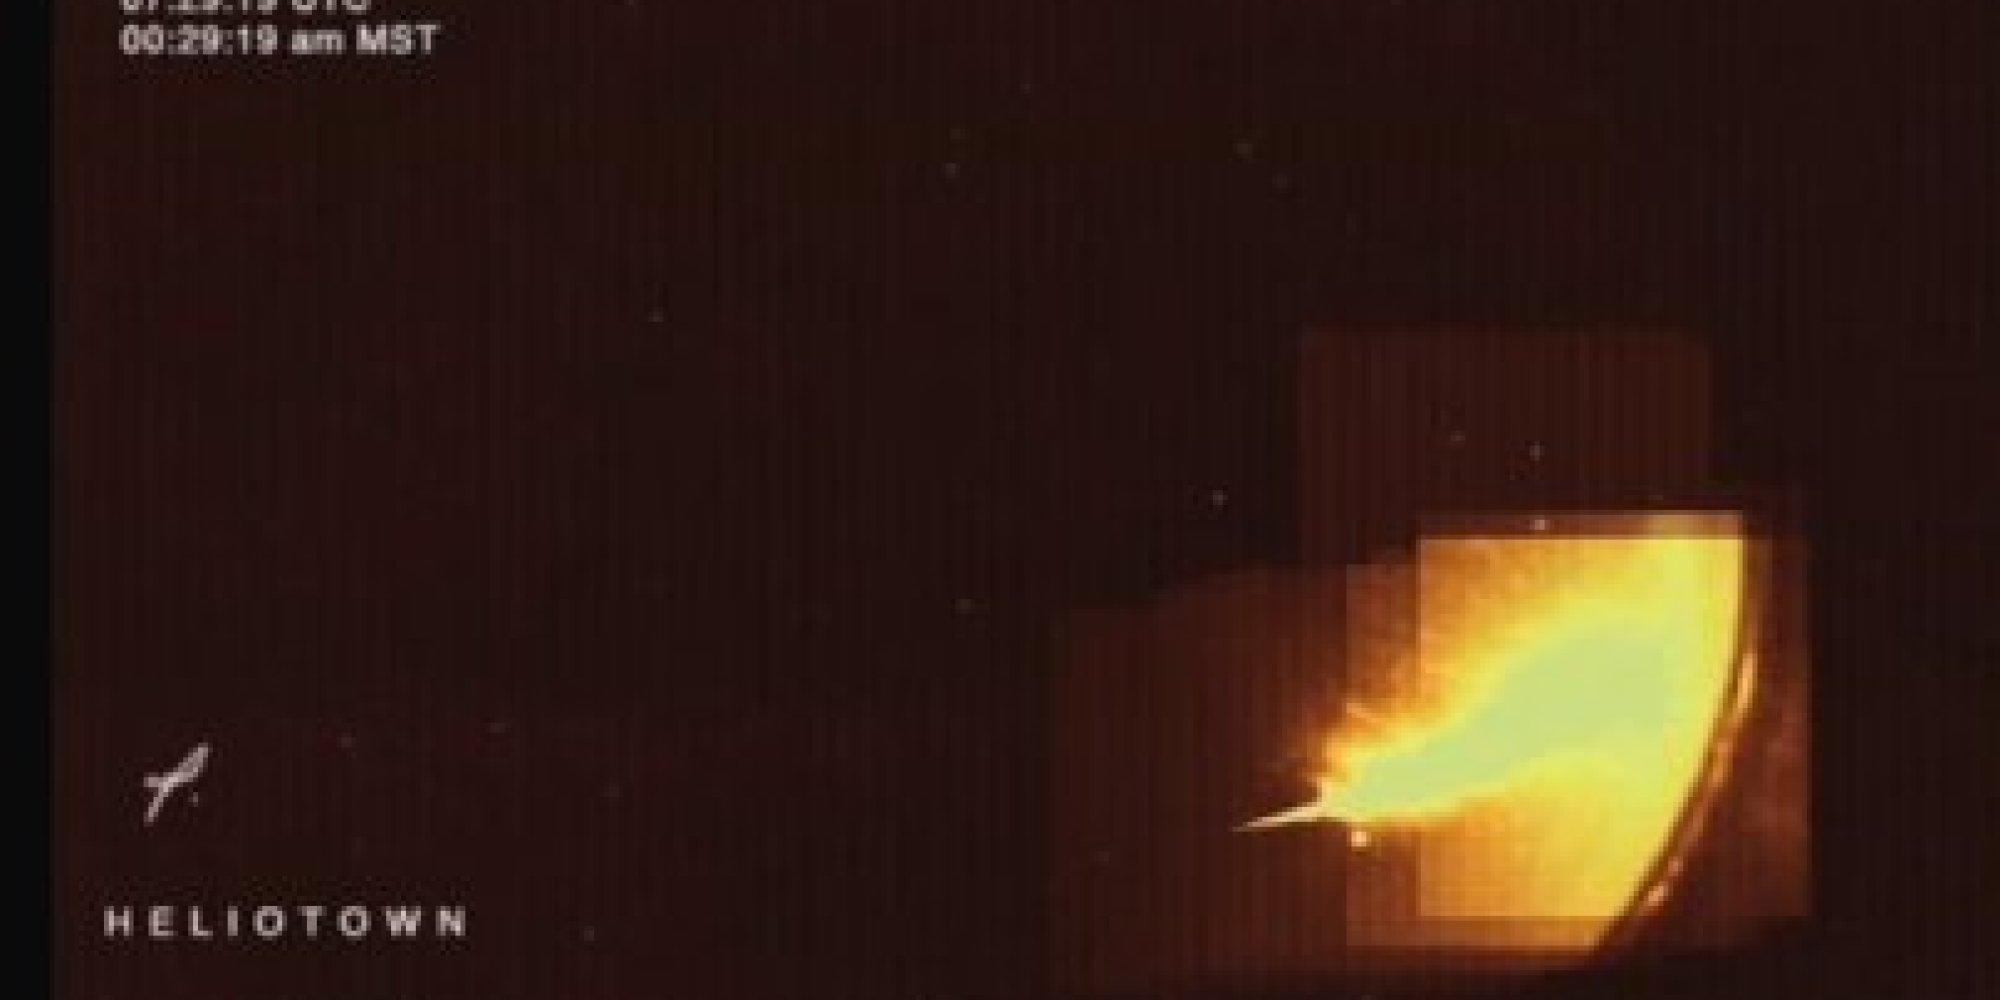 asteroid new mexico - photo #41